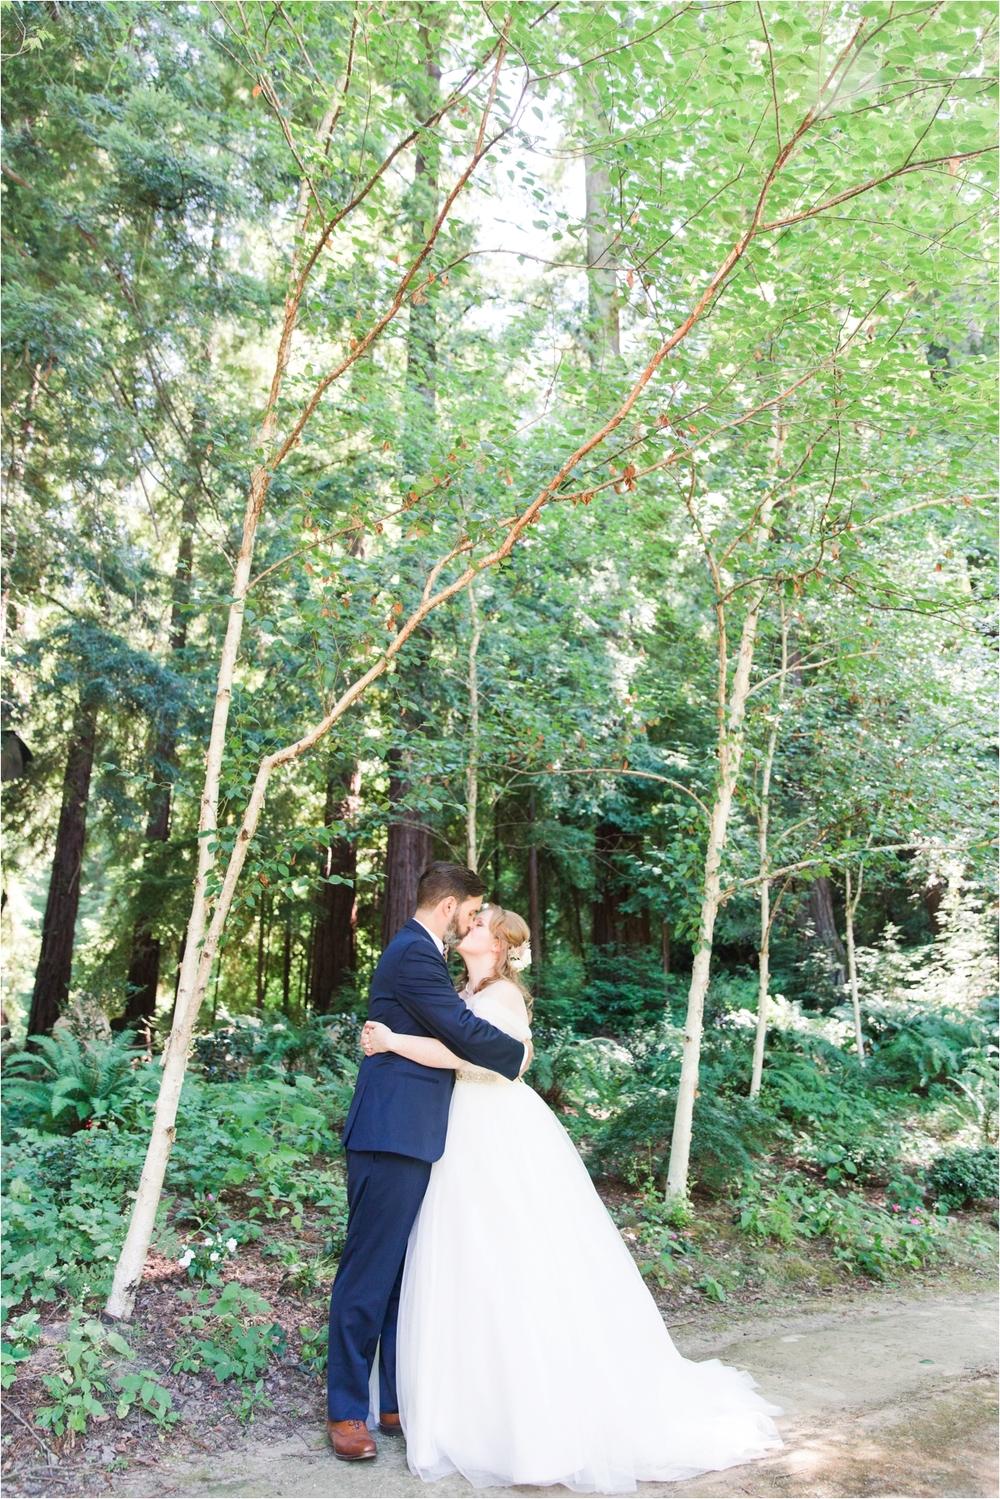 Nestldown wedding Photos by Briana Calderon Photography_0182.jpg